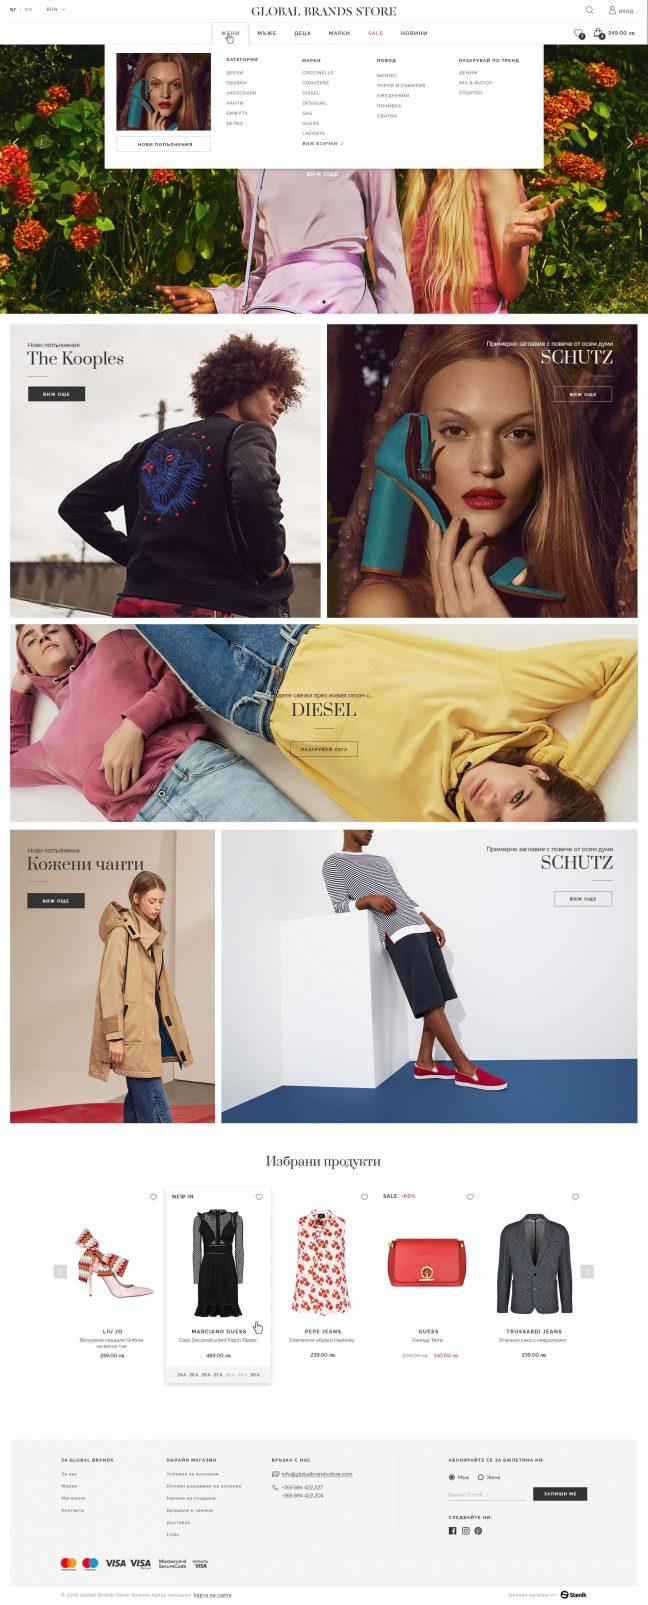 Global Brands - Начална страница.